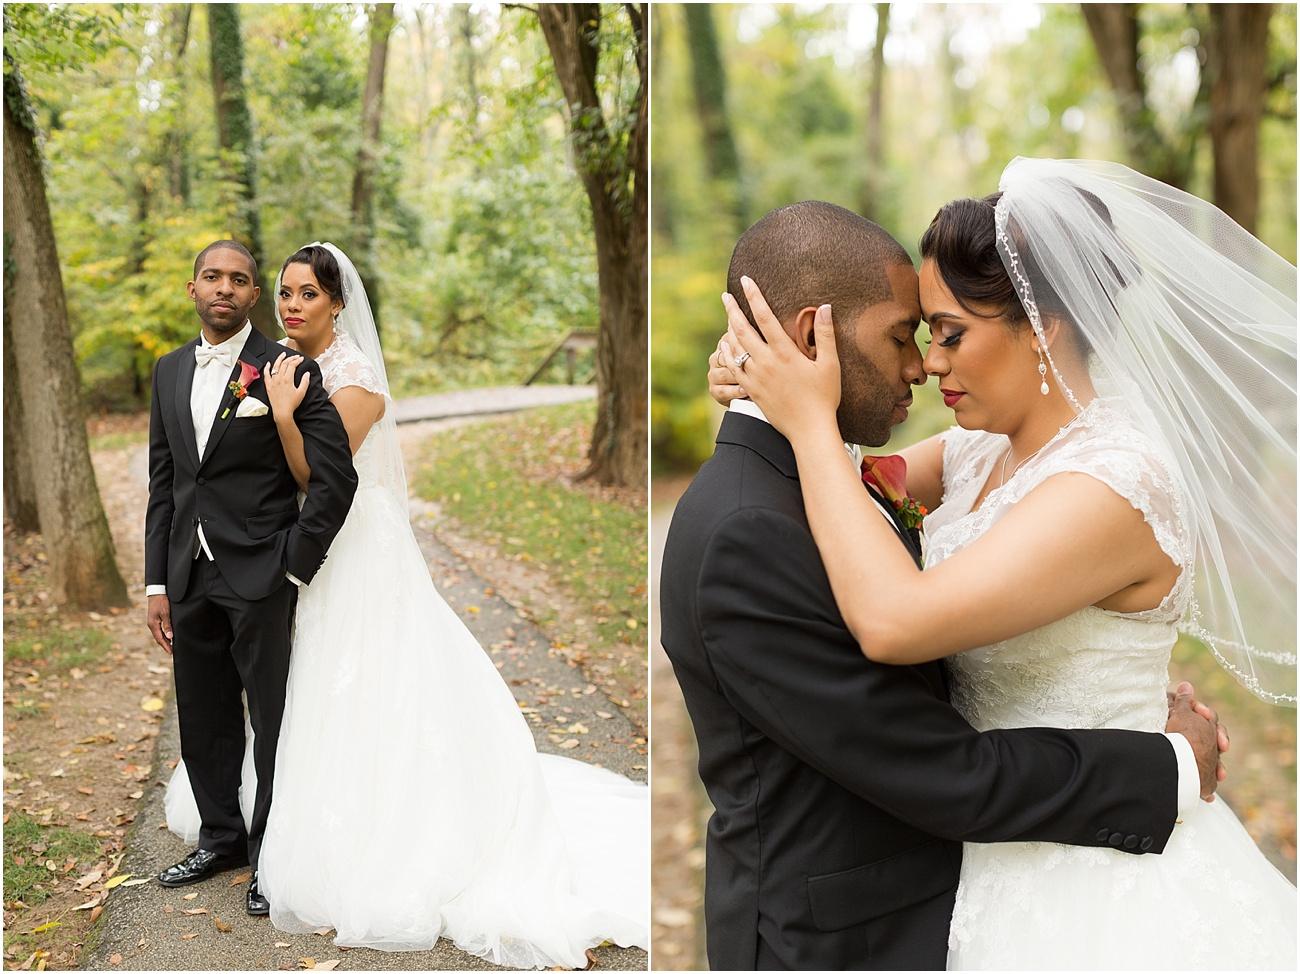 Tara+Charles_Columbia_Maryland_wedding_photographer_0006